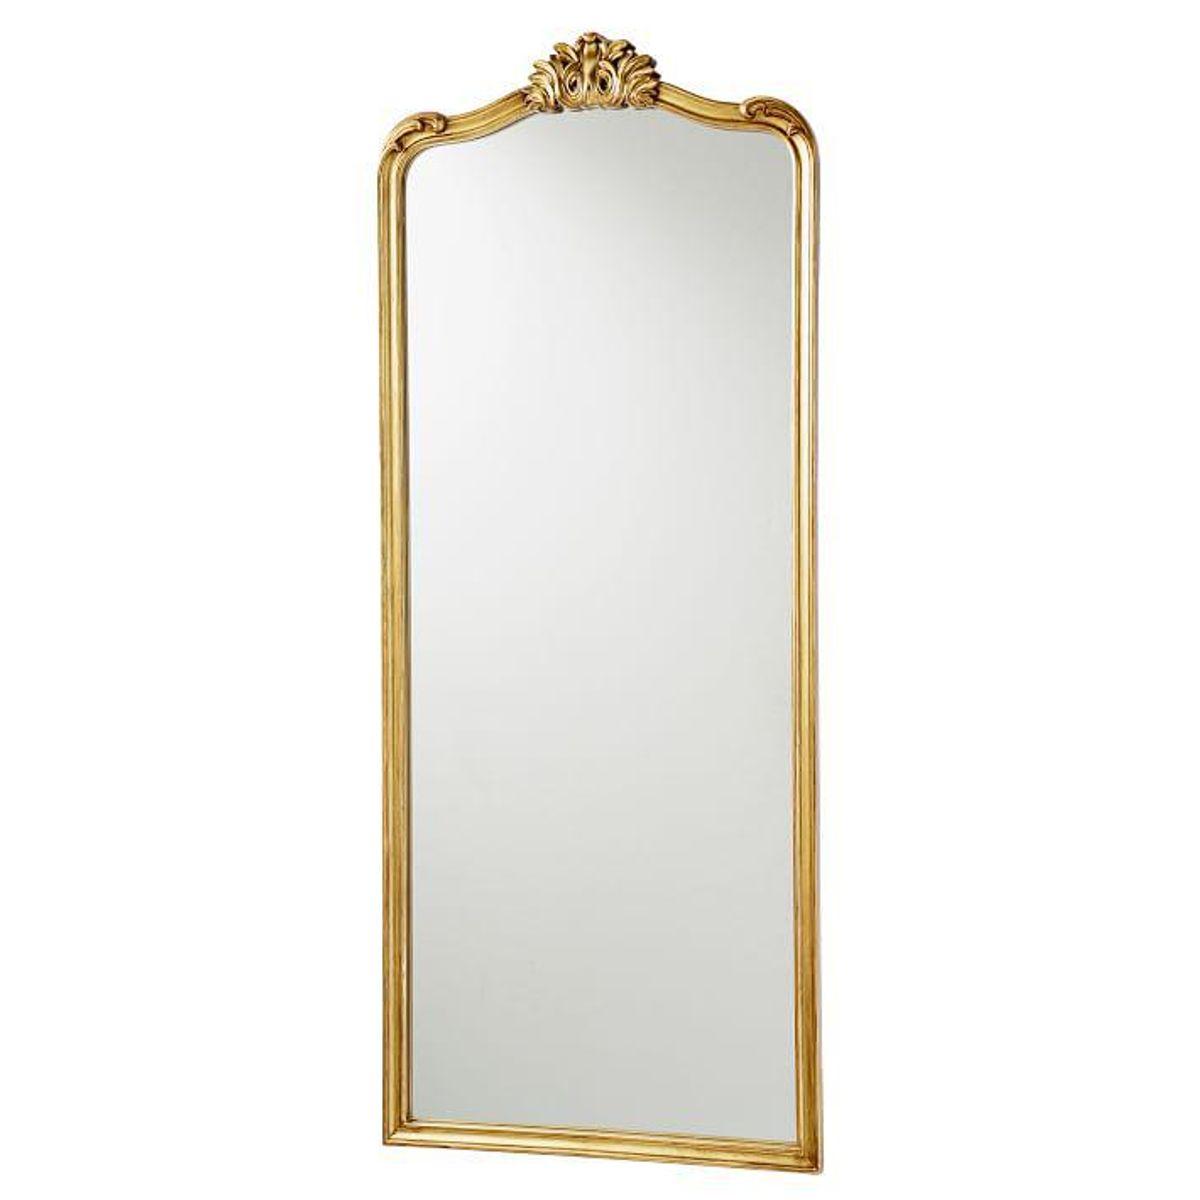 Ornate Filigree Mirror, 24 x 60